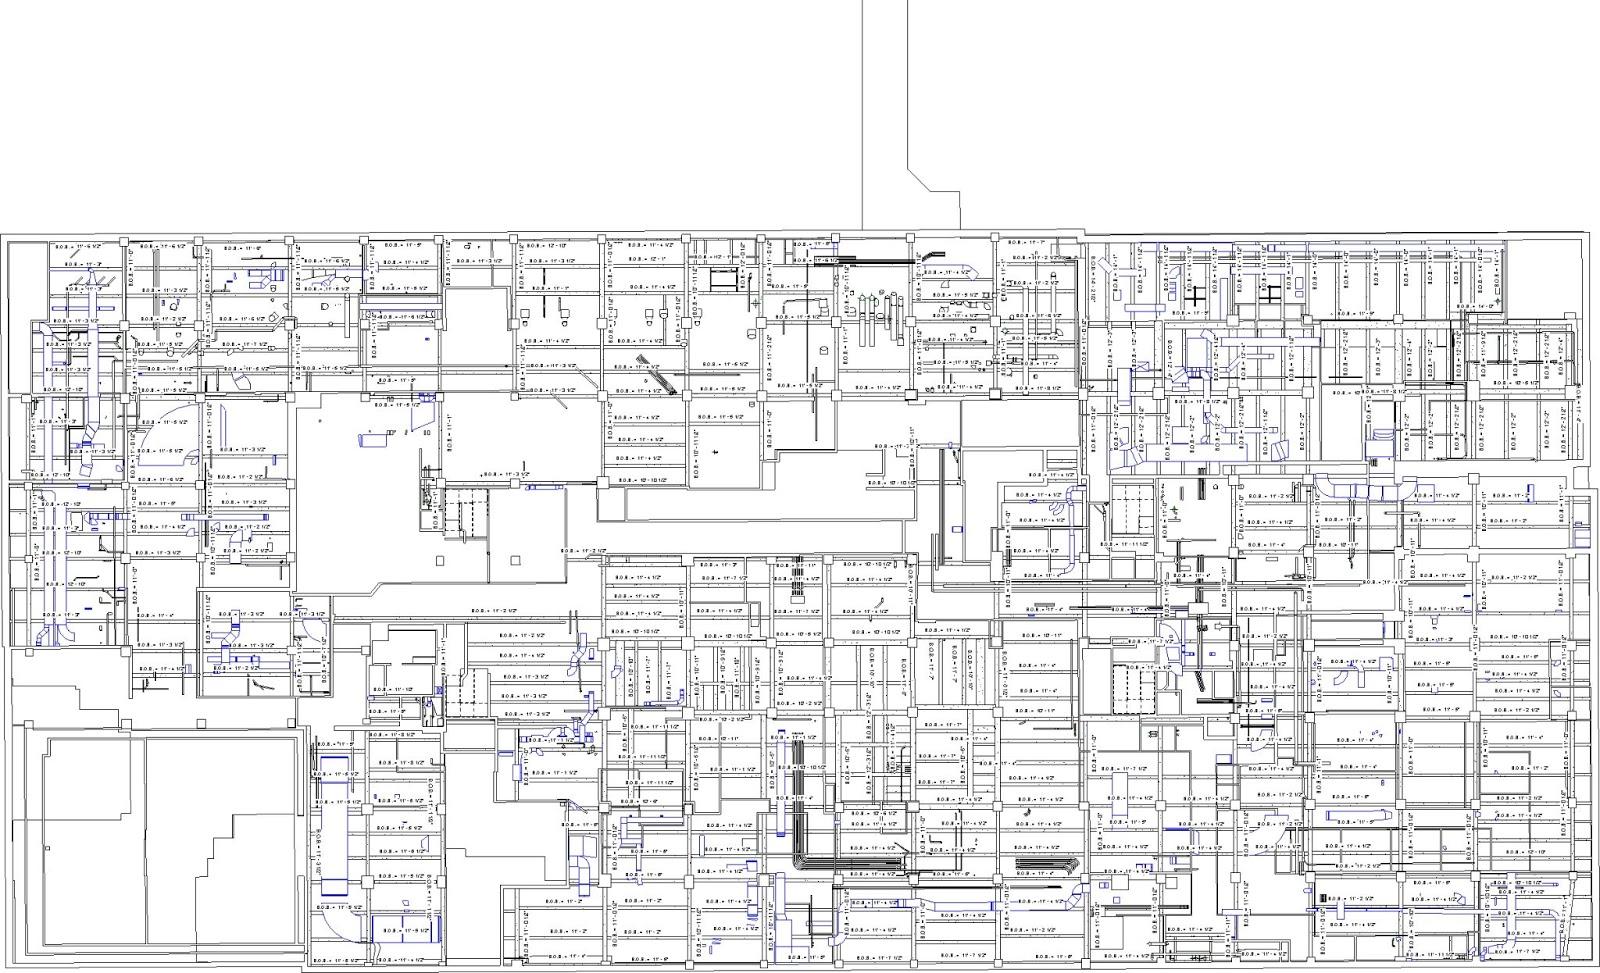 51 Madison Floors - Reflected Ceiling Plan - 3B